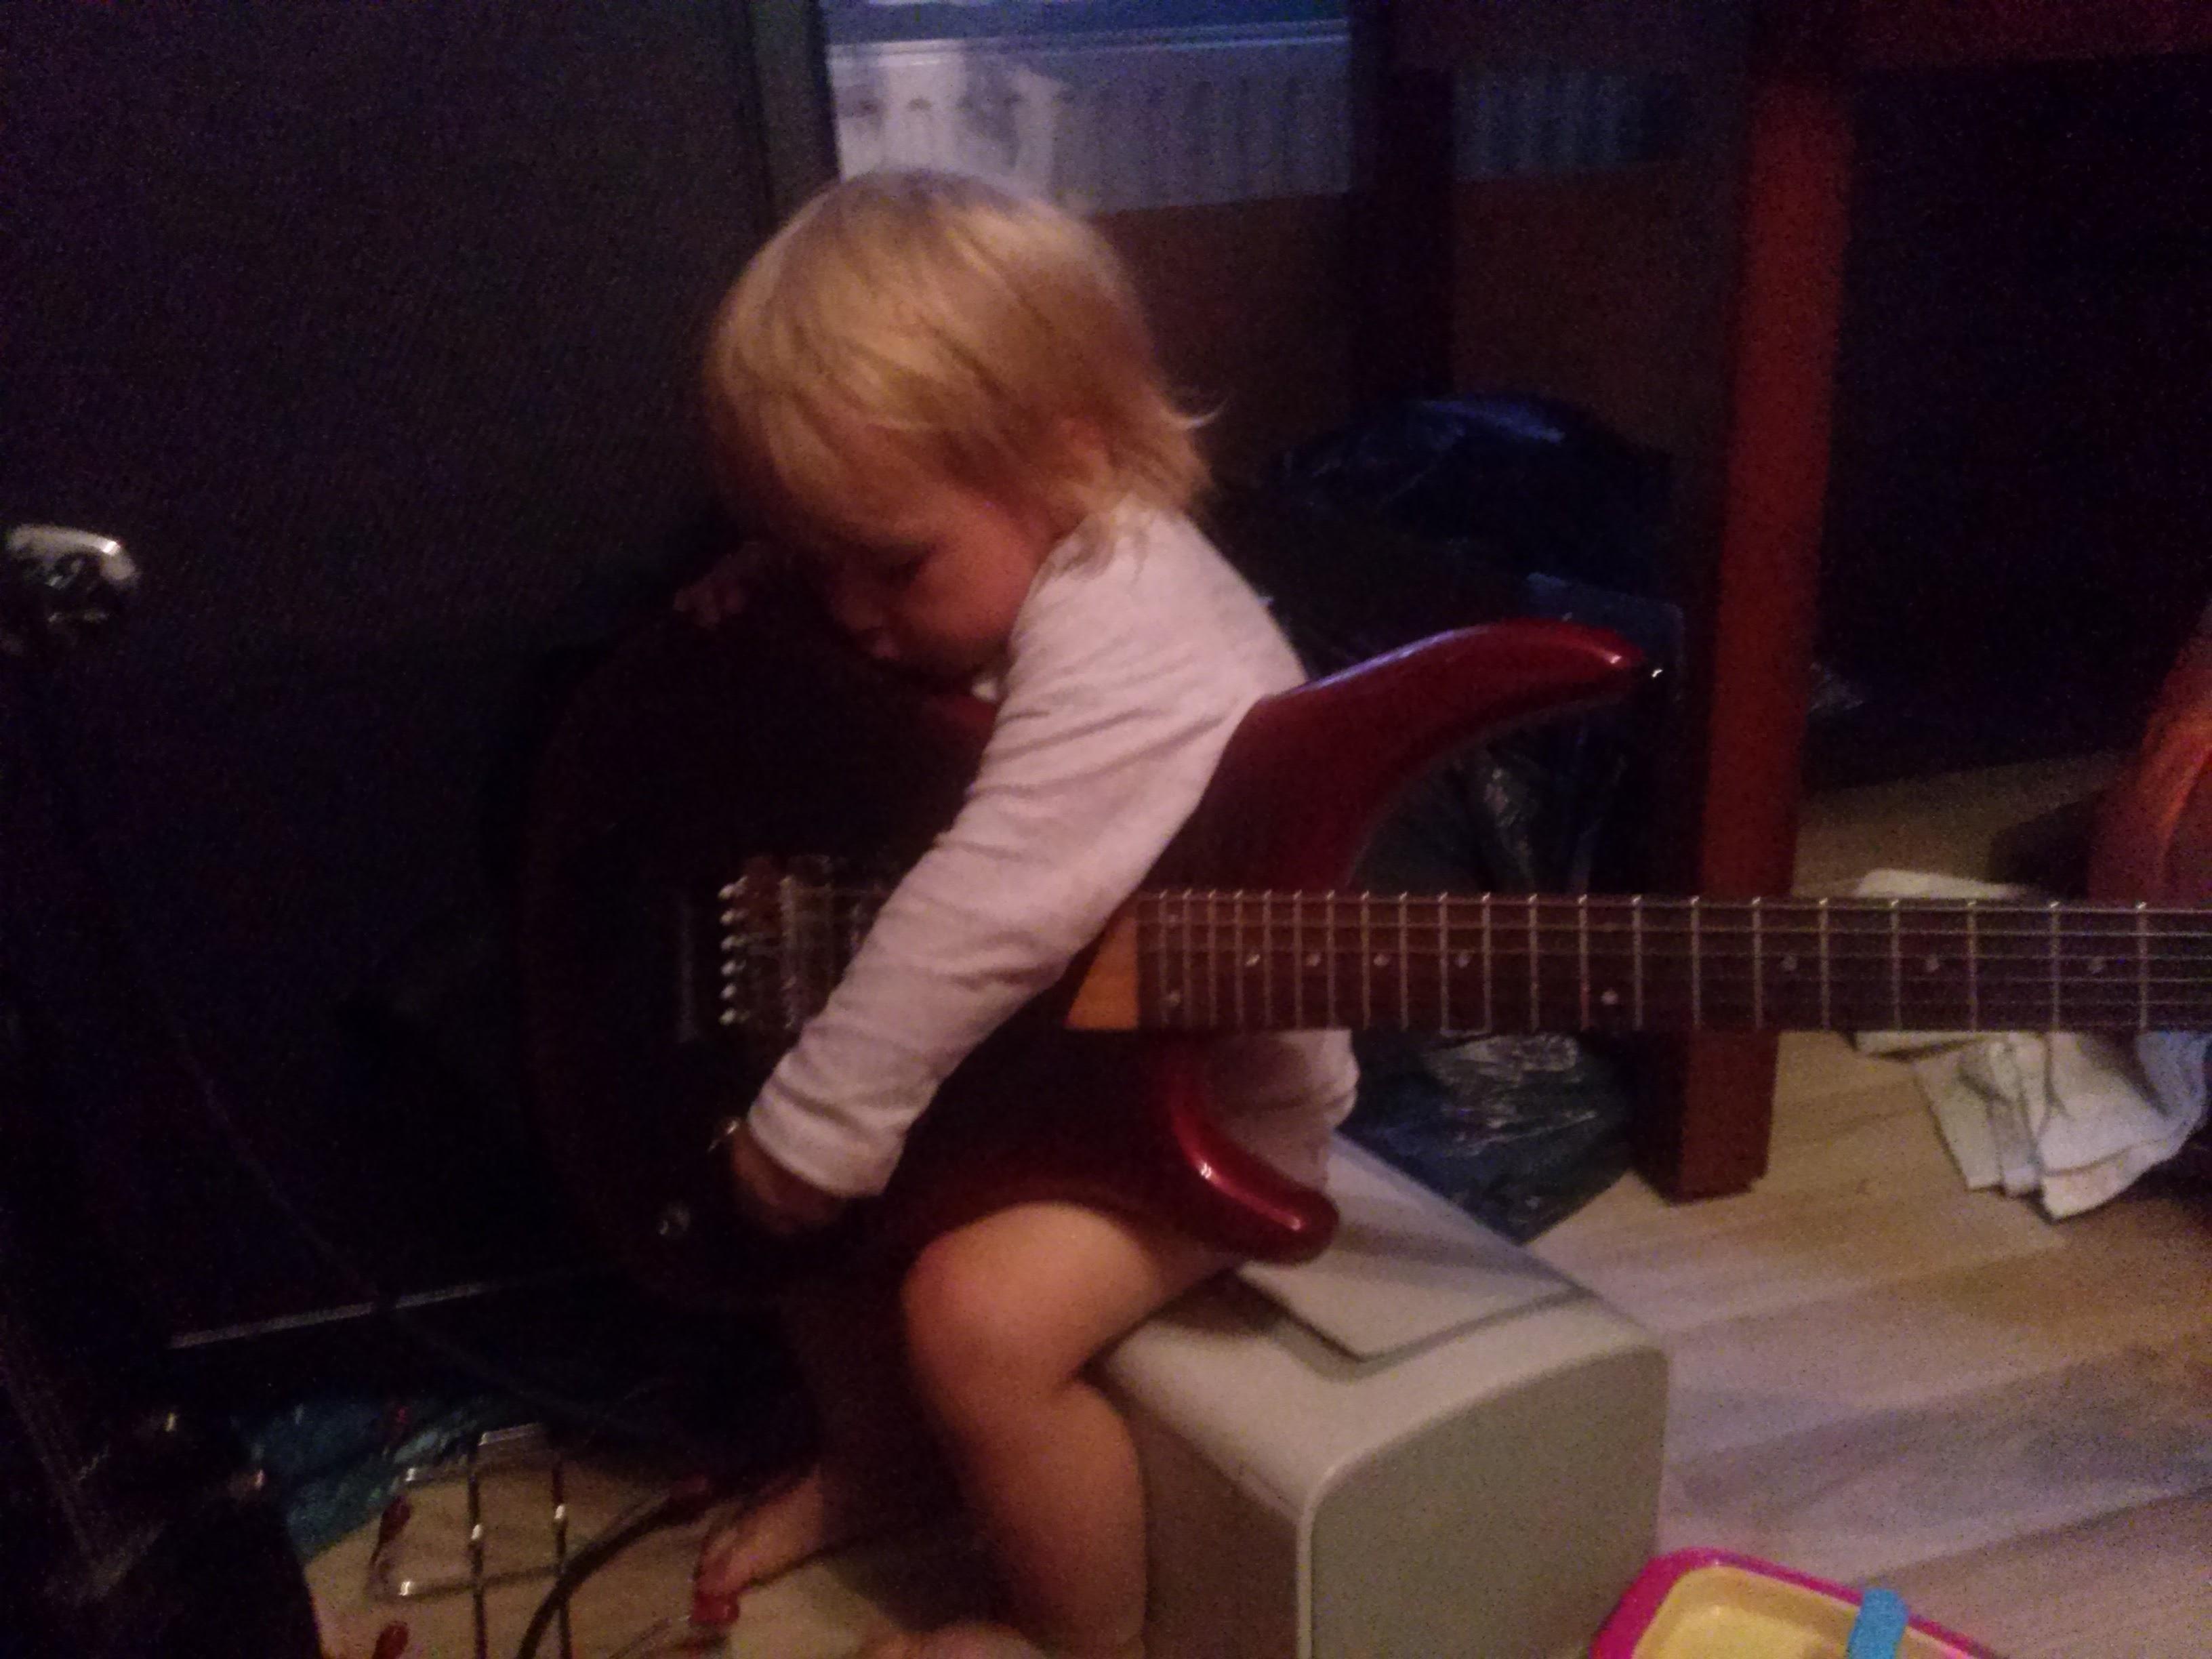 obrazek: Córeczka na gitarce   - elektronika i schematy- Galeria - GuitarFail - 20160715 200359